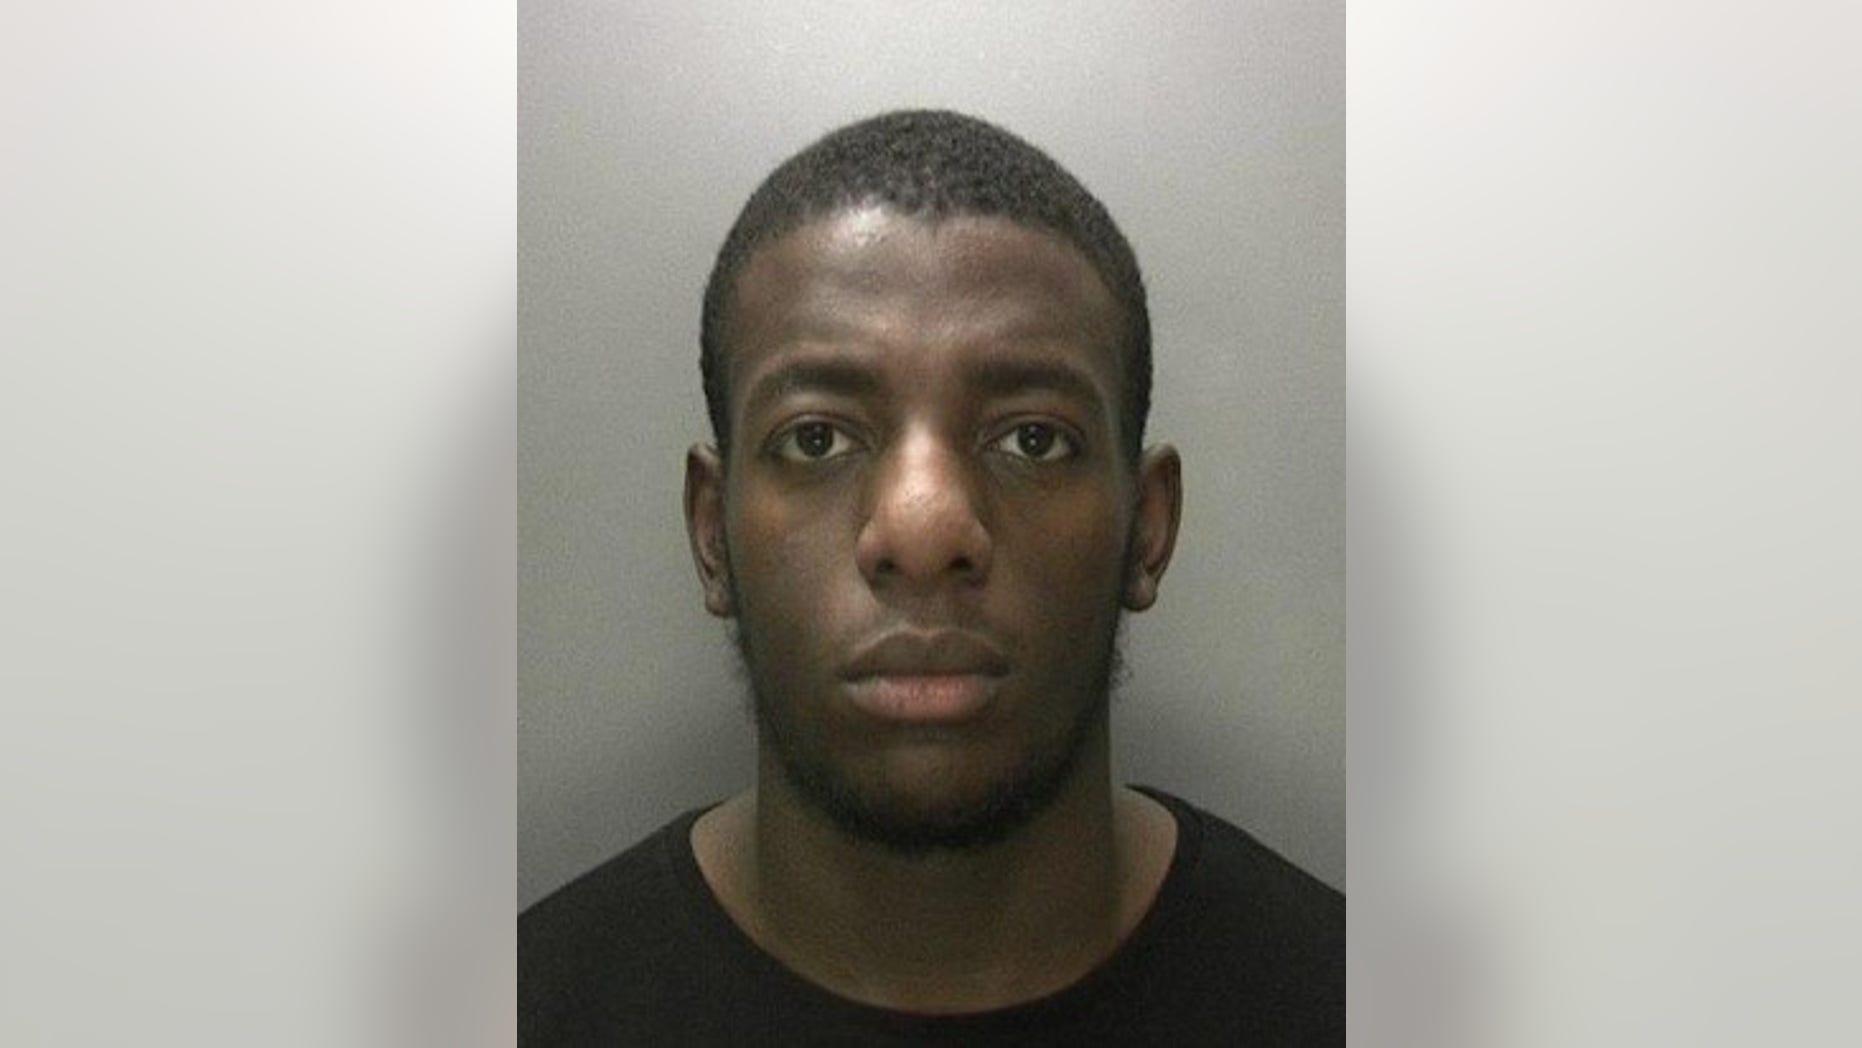 (West Midlands Police)